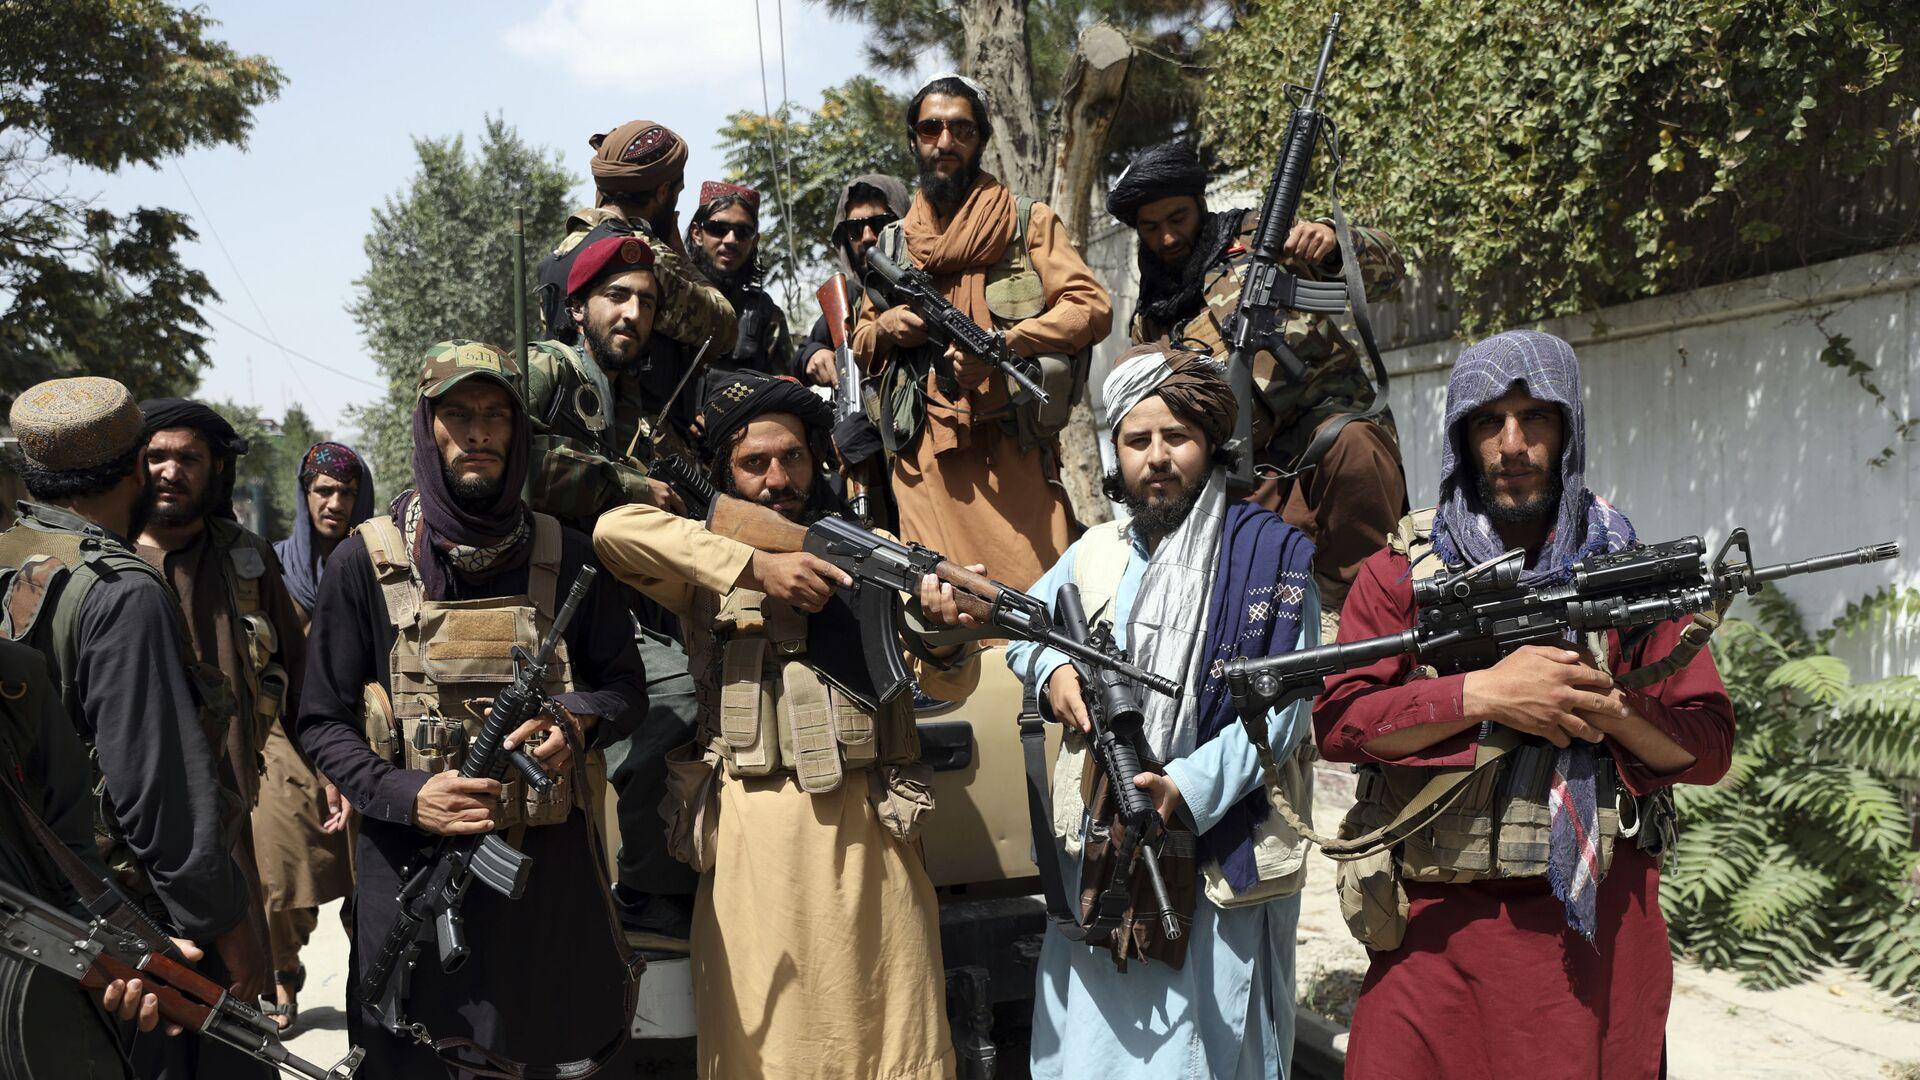 I membri dei talebani* a Kabul - Sputnik Italia, 1920, 16.09.2021